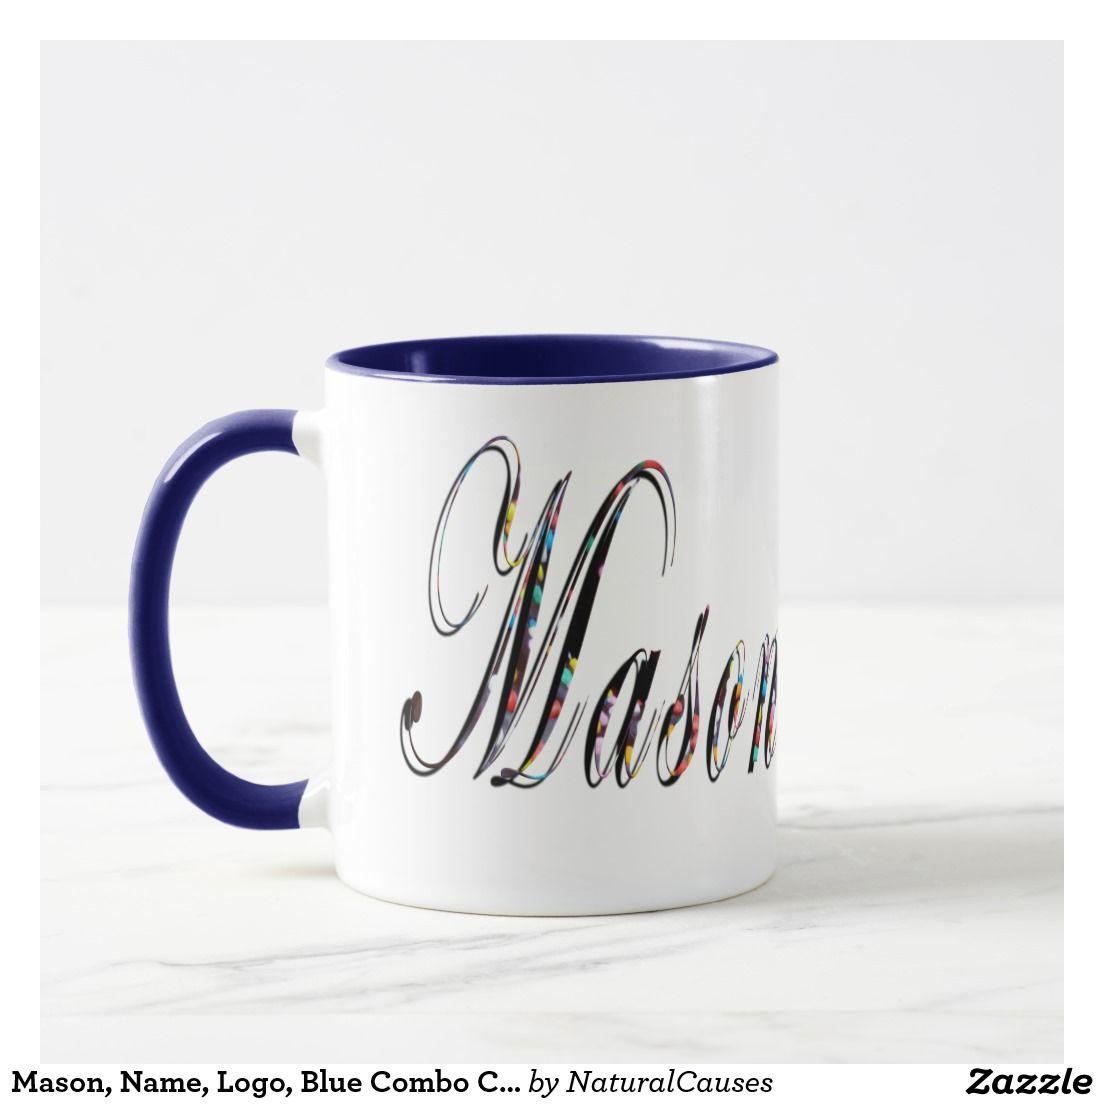 Mason, Name, Logo, Blue Combo Coffee Mug. Mug